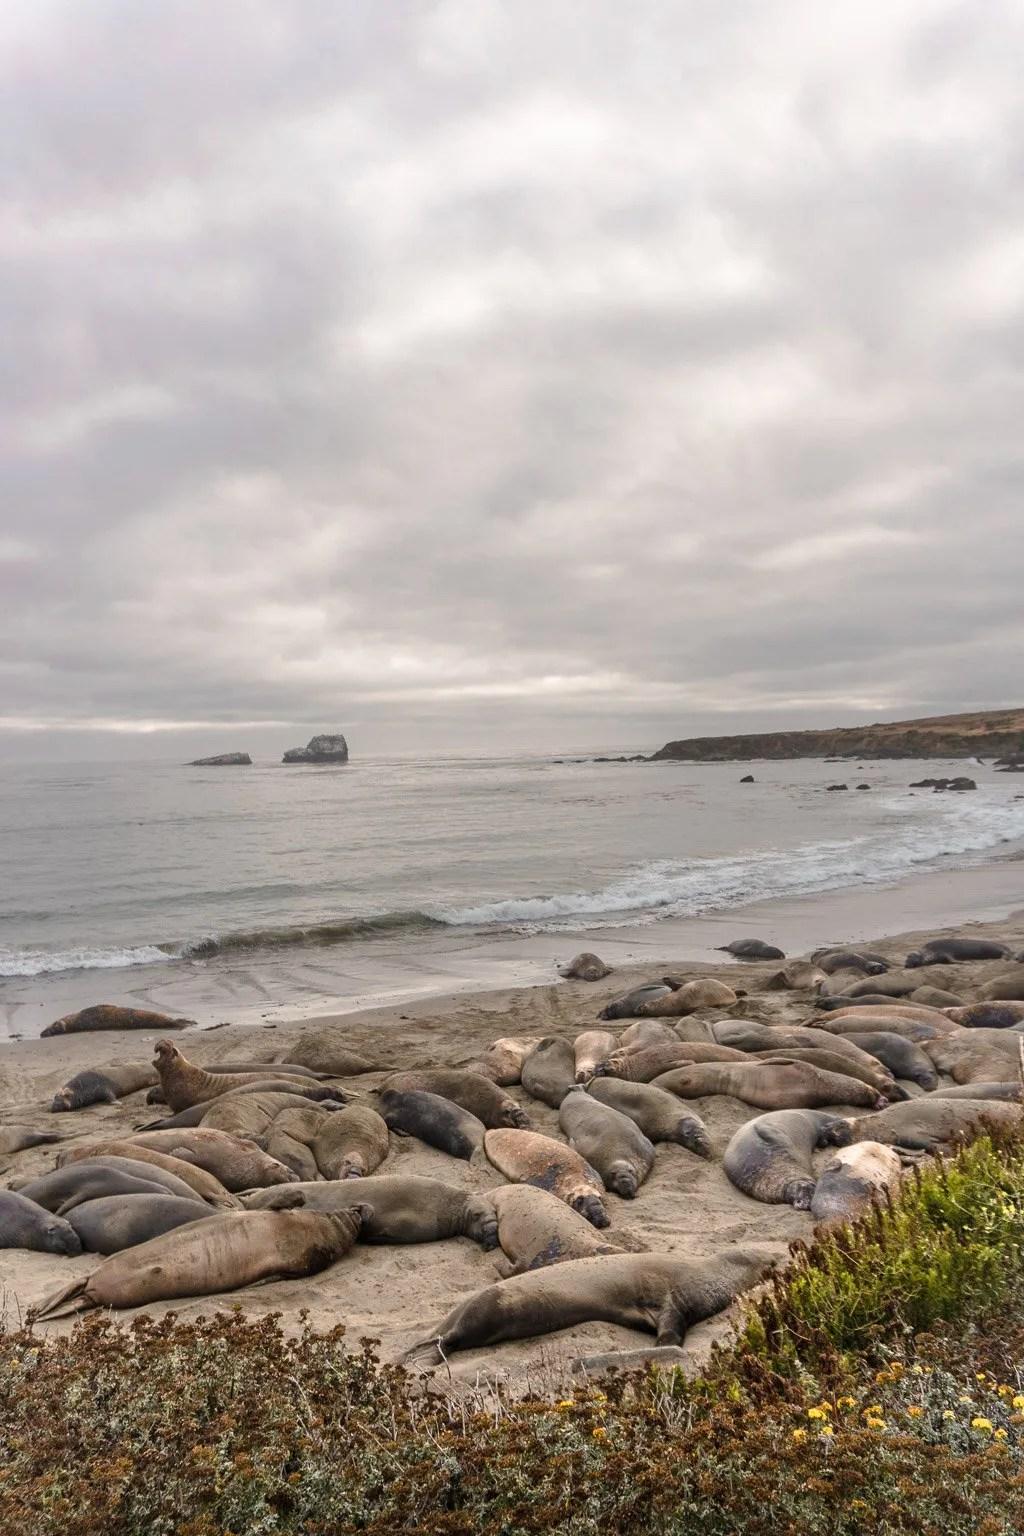 Piedras Blancas Elephant Seal near San Luis Obispo on the California Coast